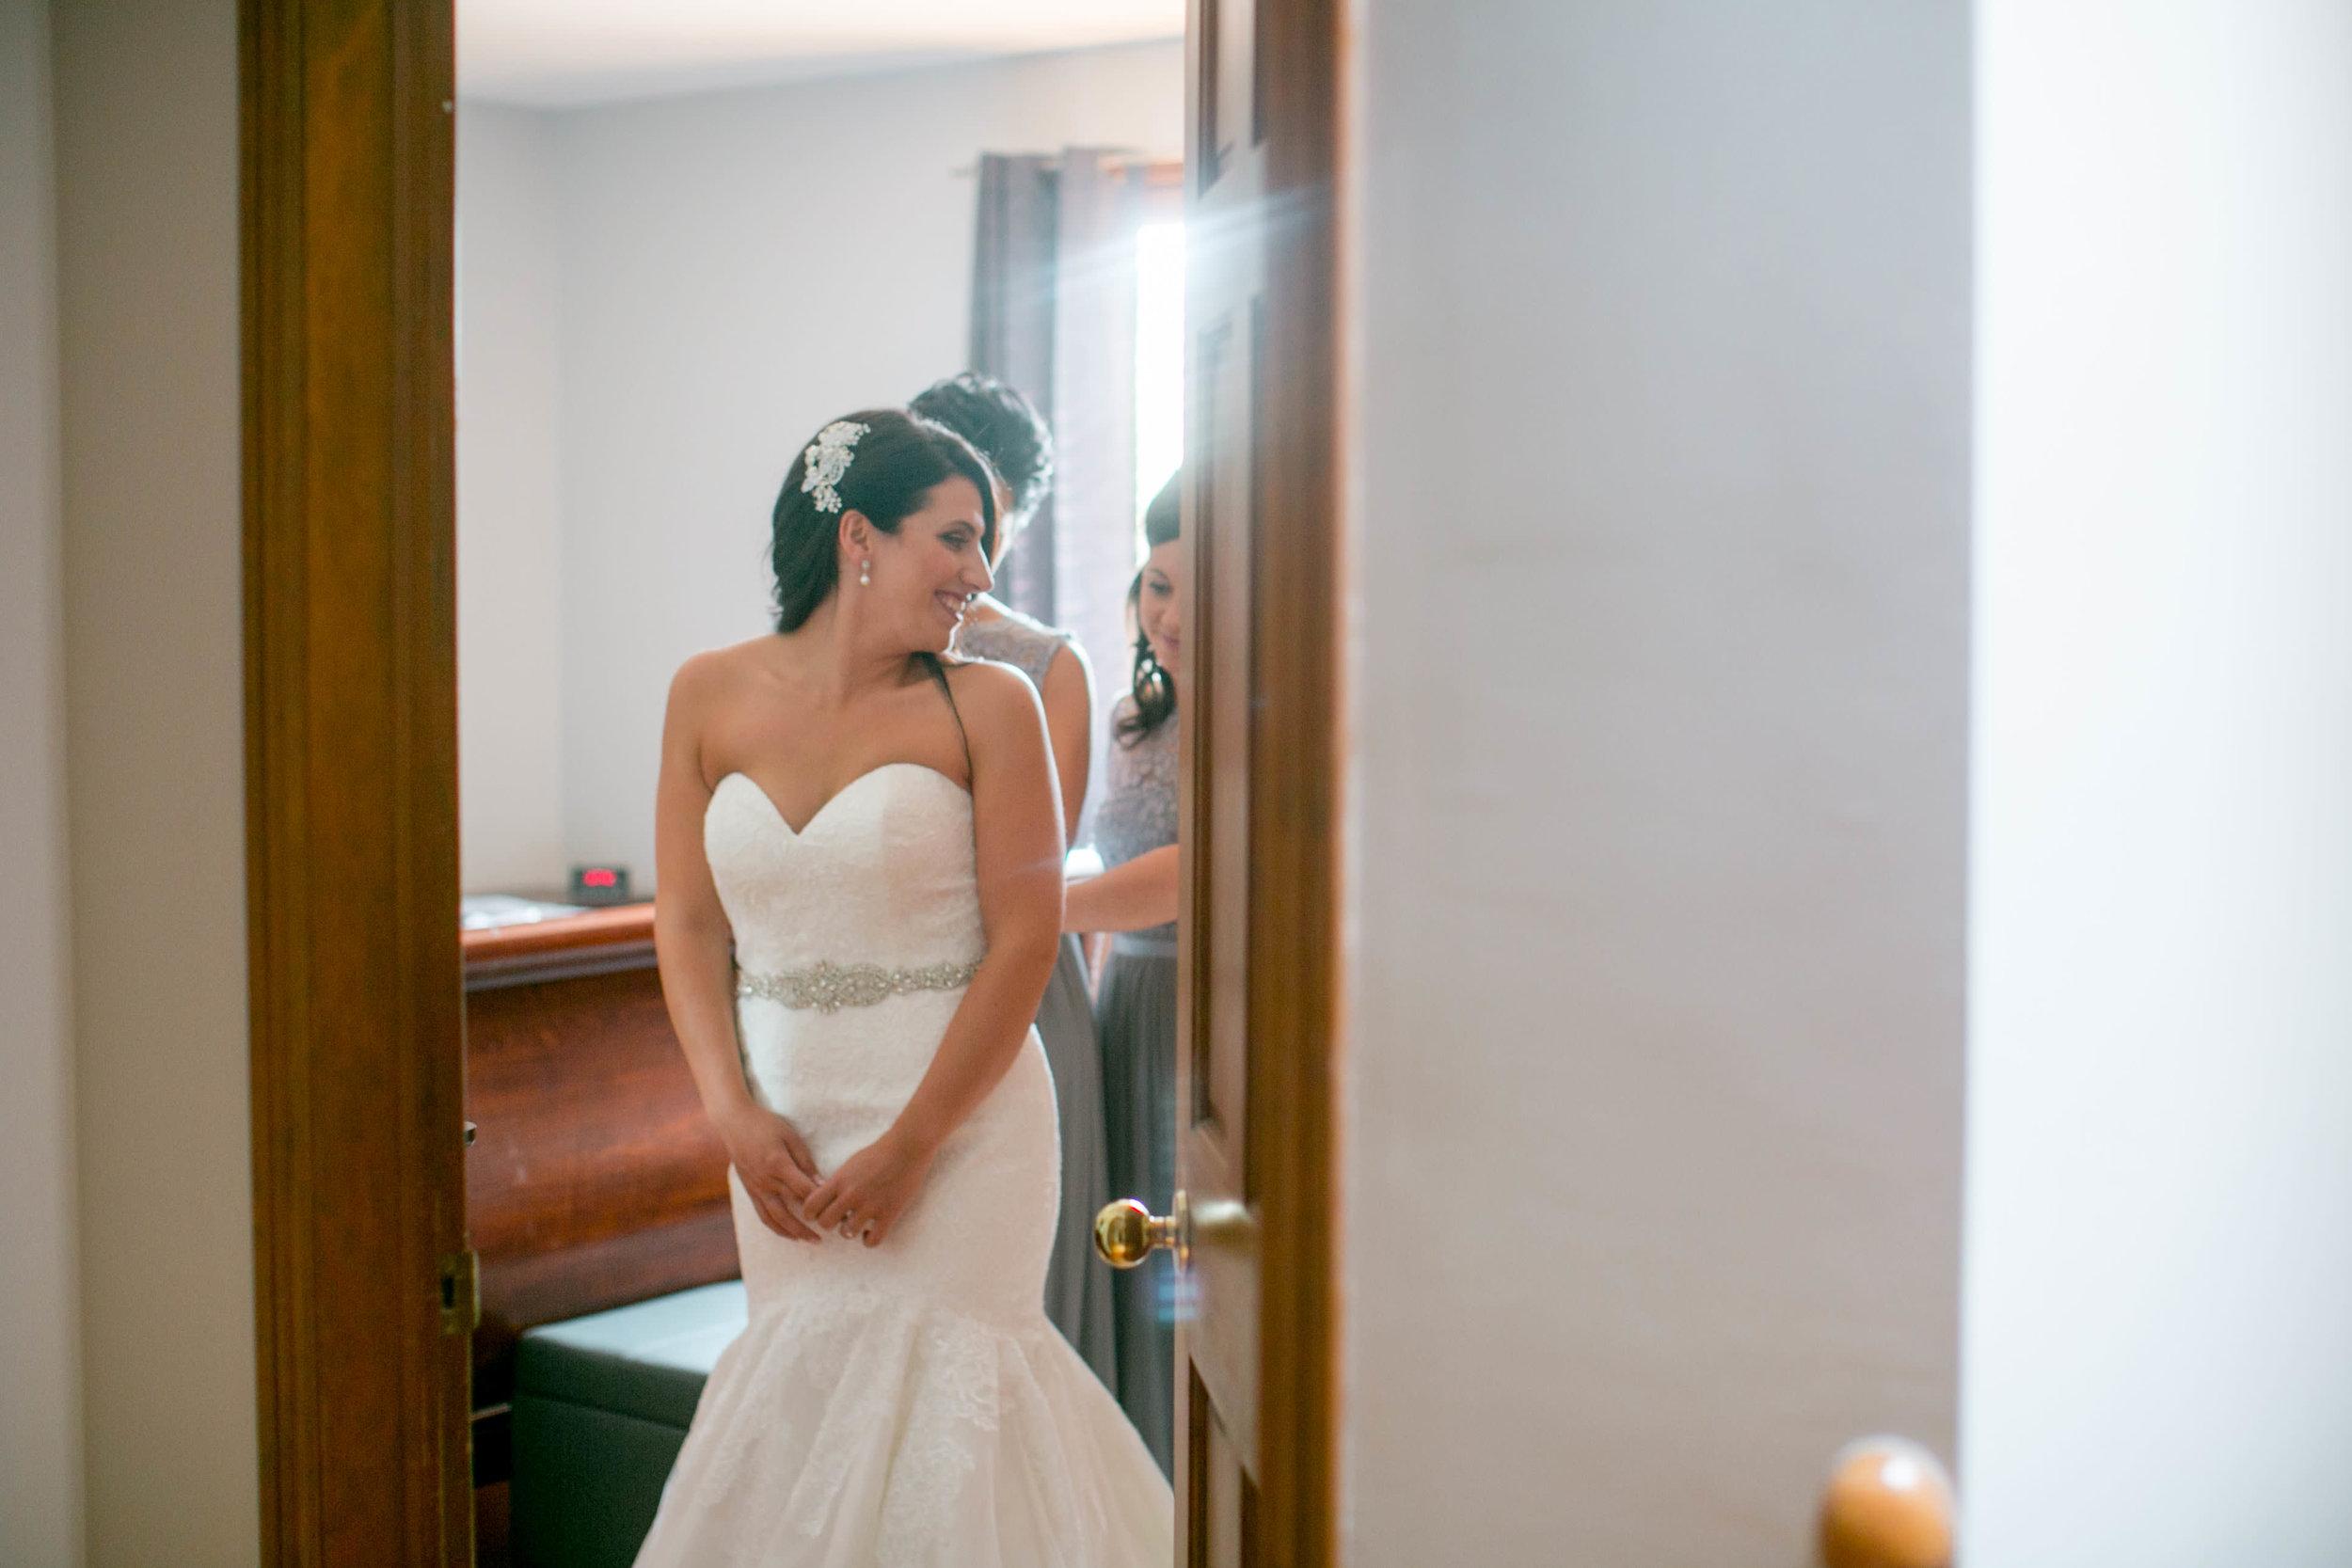 Stefanie___Bernard___Daniel_Ricci_Weddings_High_Res._Finals__074.jpg